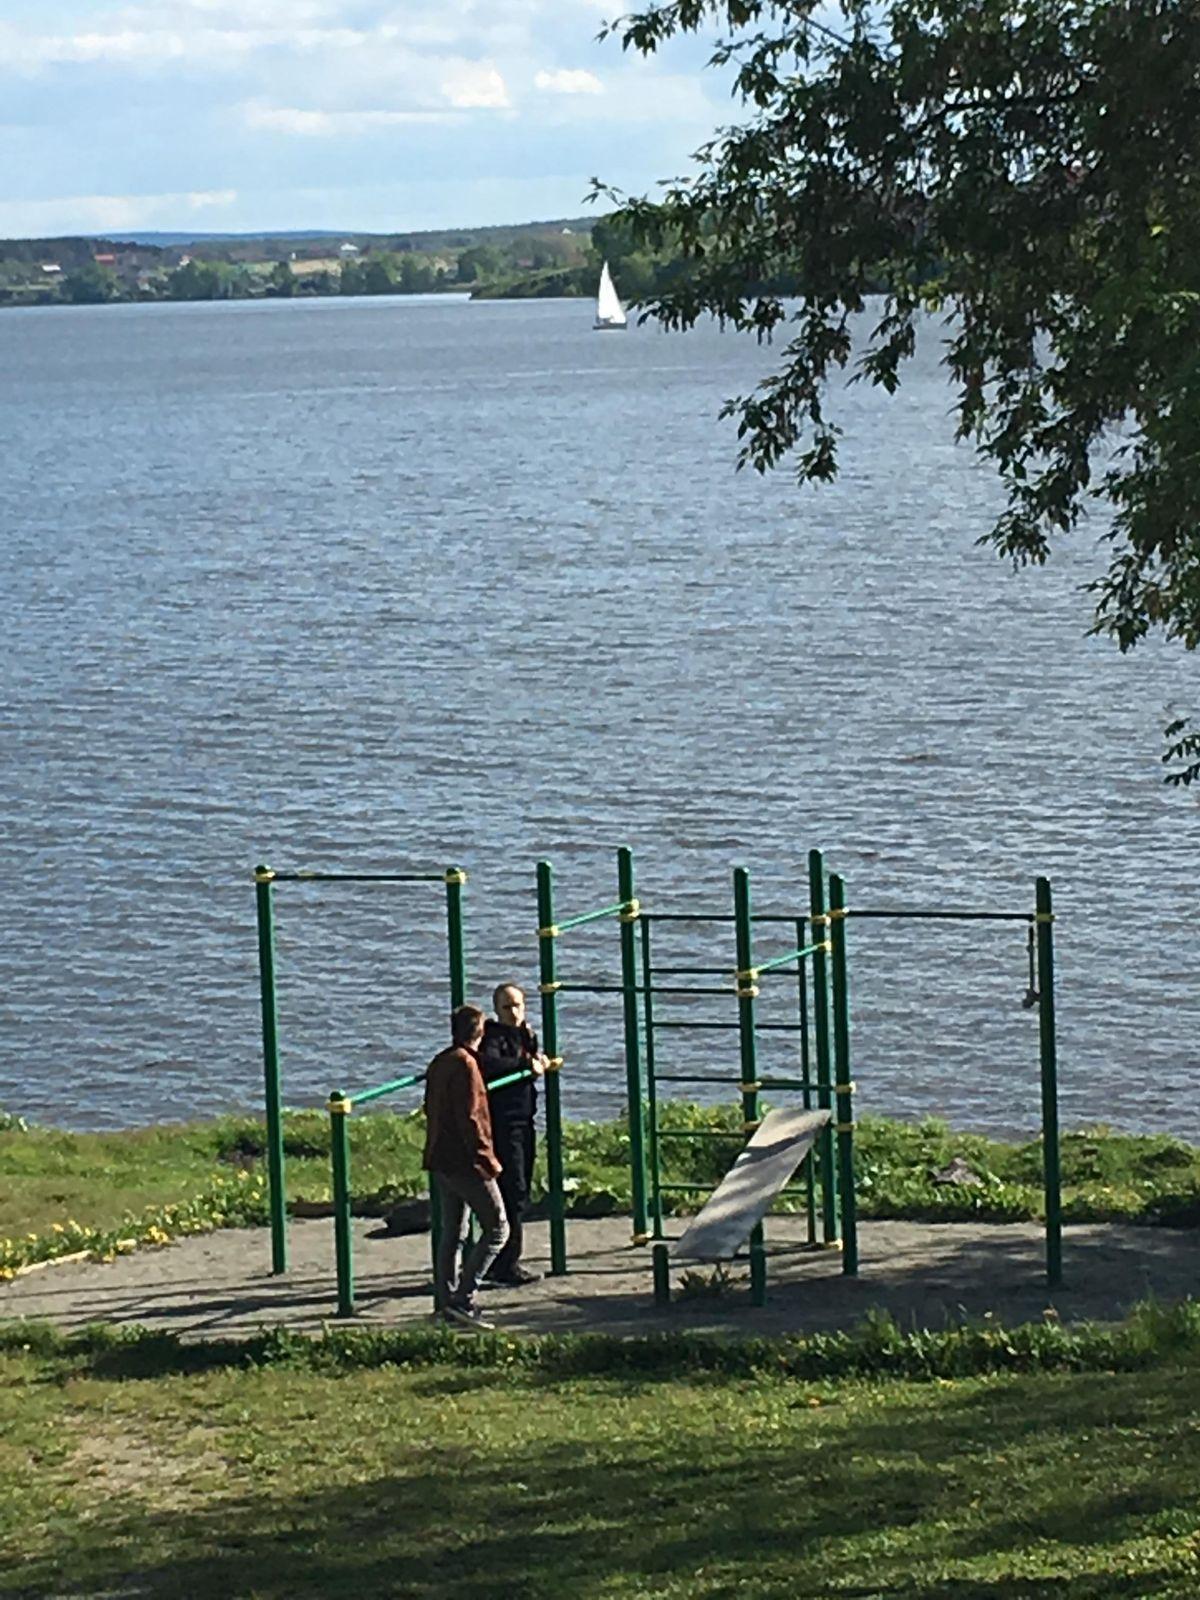 Nizhny Tagil - Street Workout Park - Park Inn NTagil